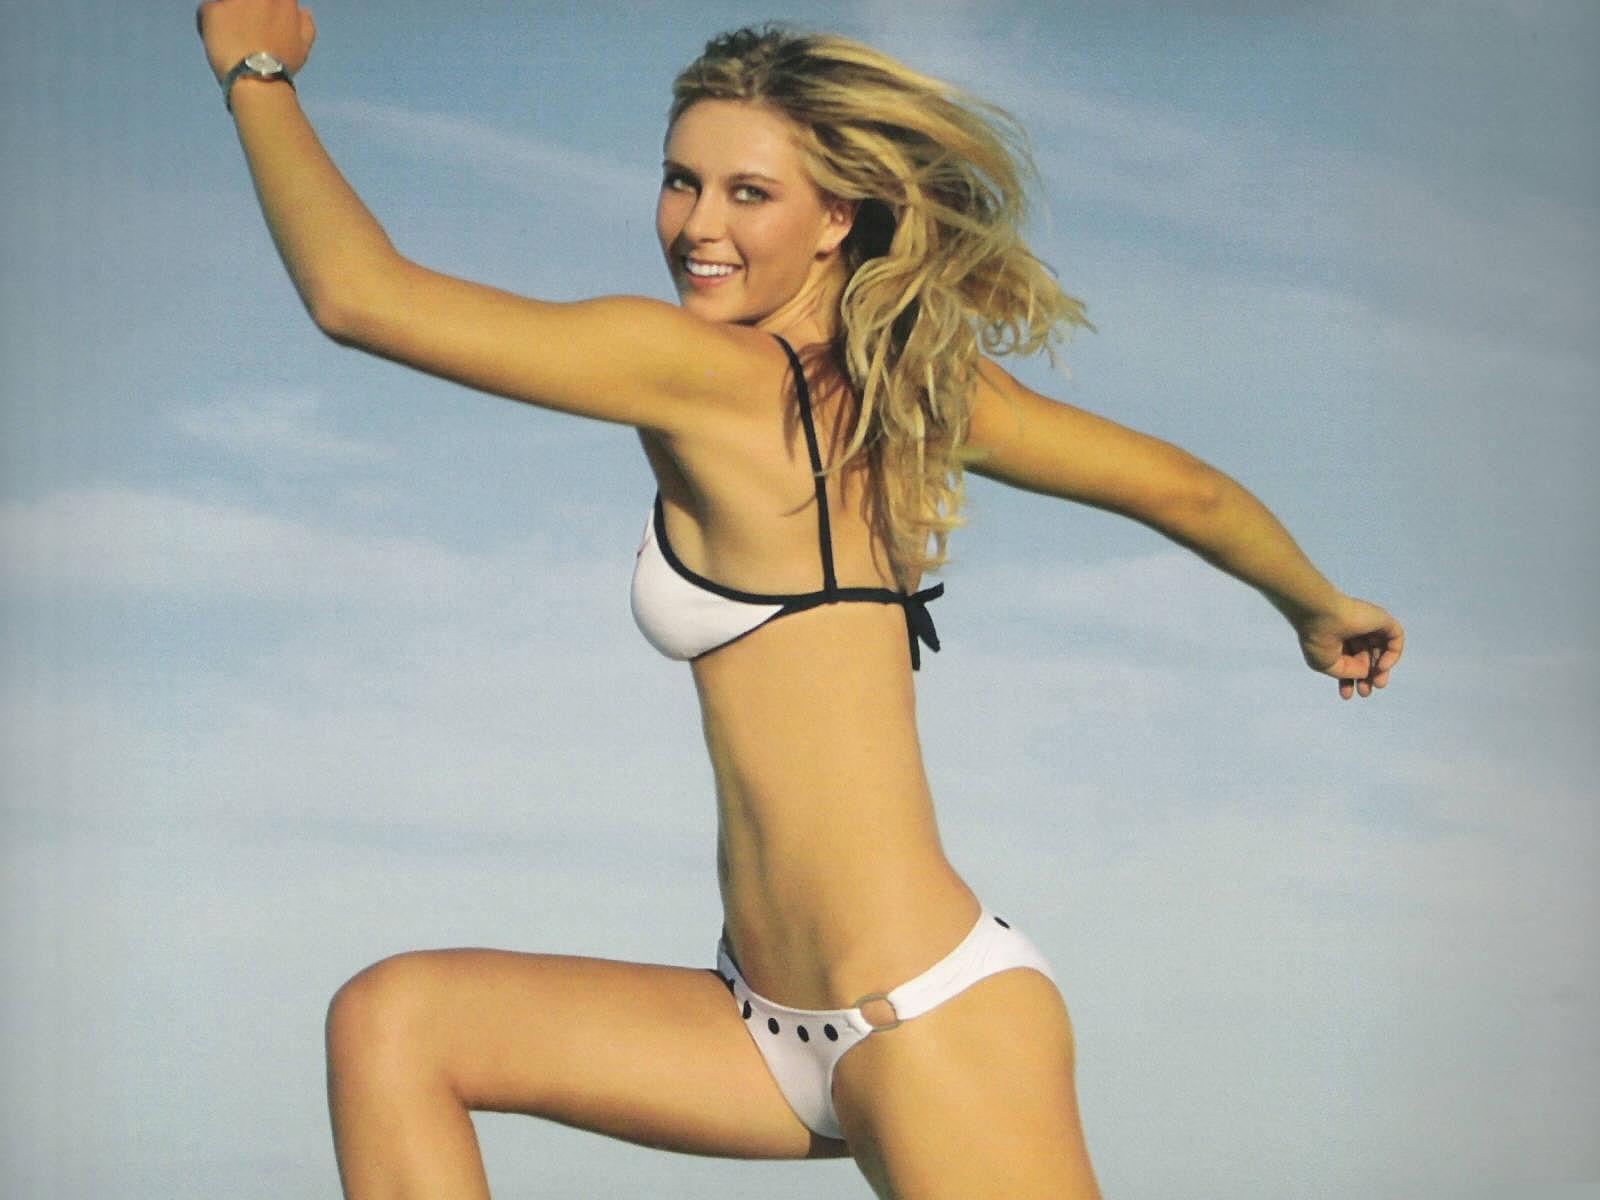 Women s bikini swimwear Colloyes      Black  Green Lace Trim sexy Bathing  Suit With Triangle Top and